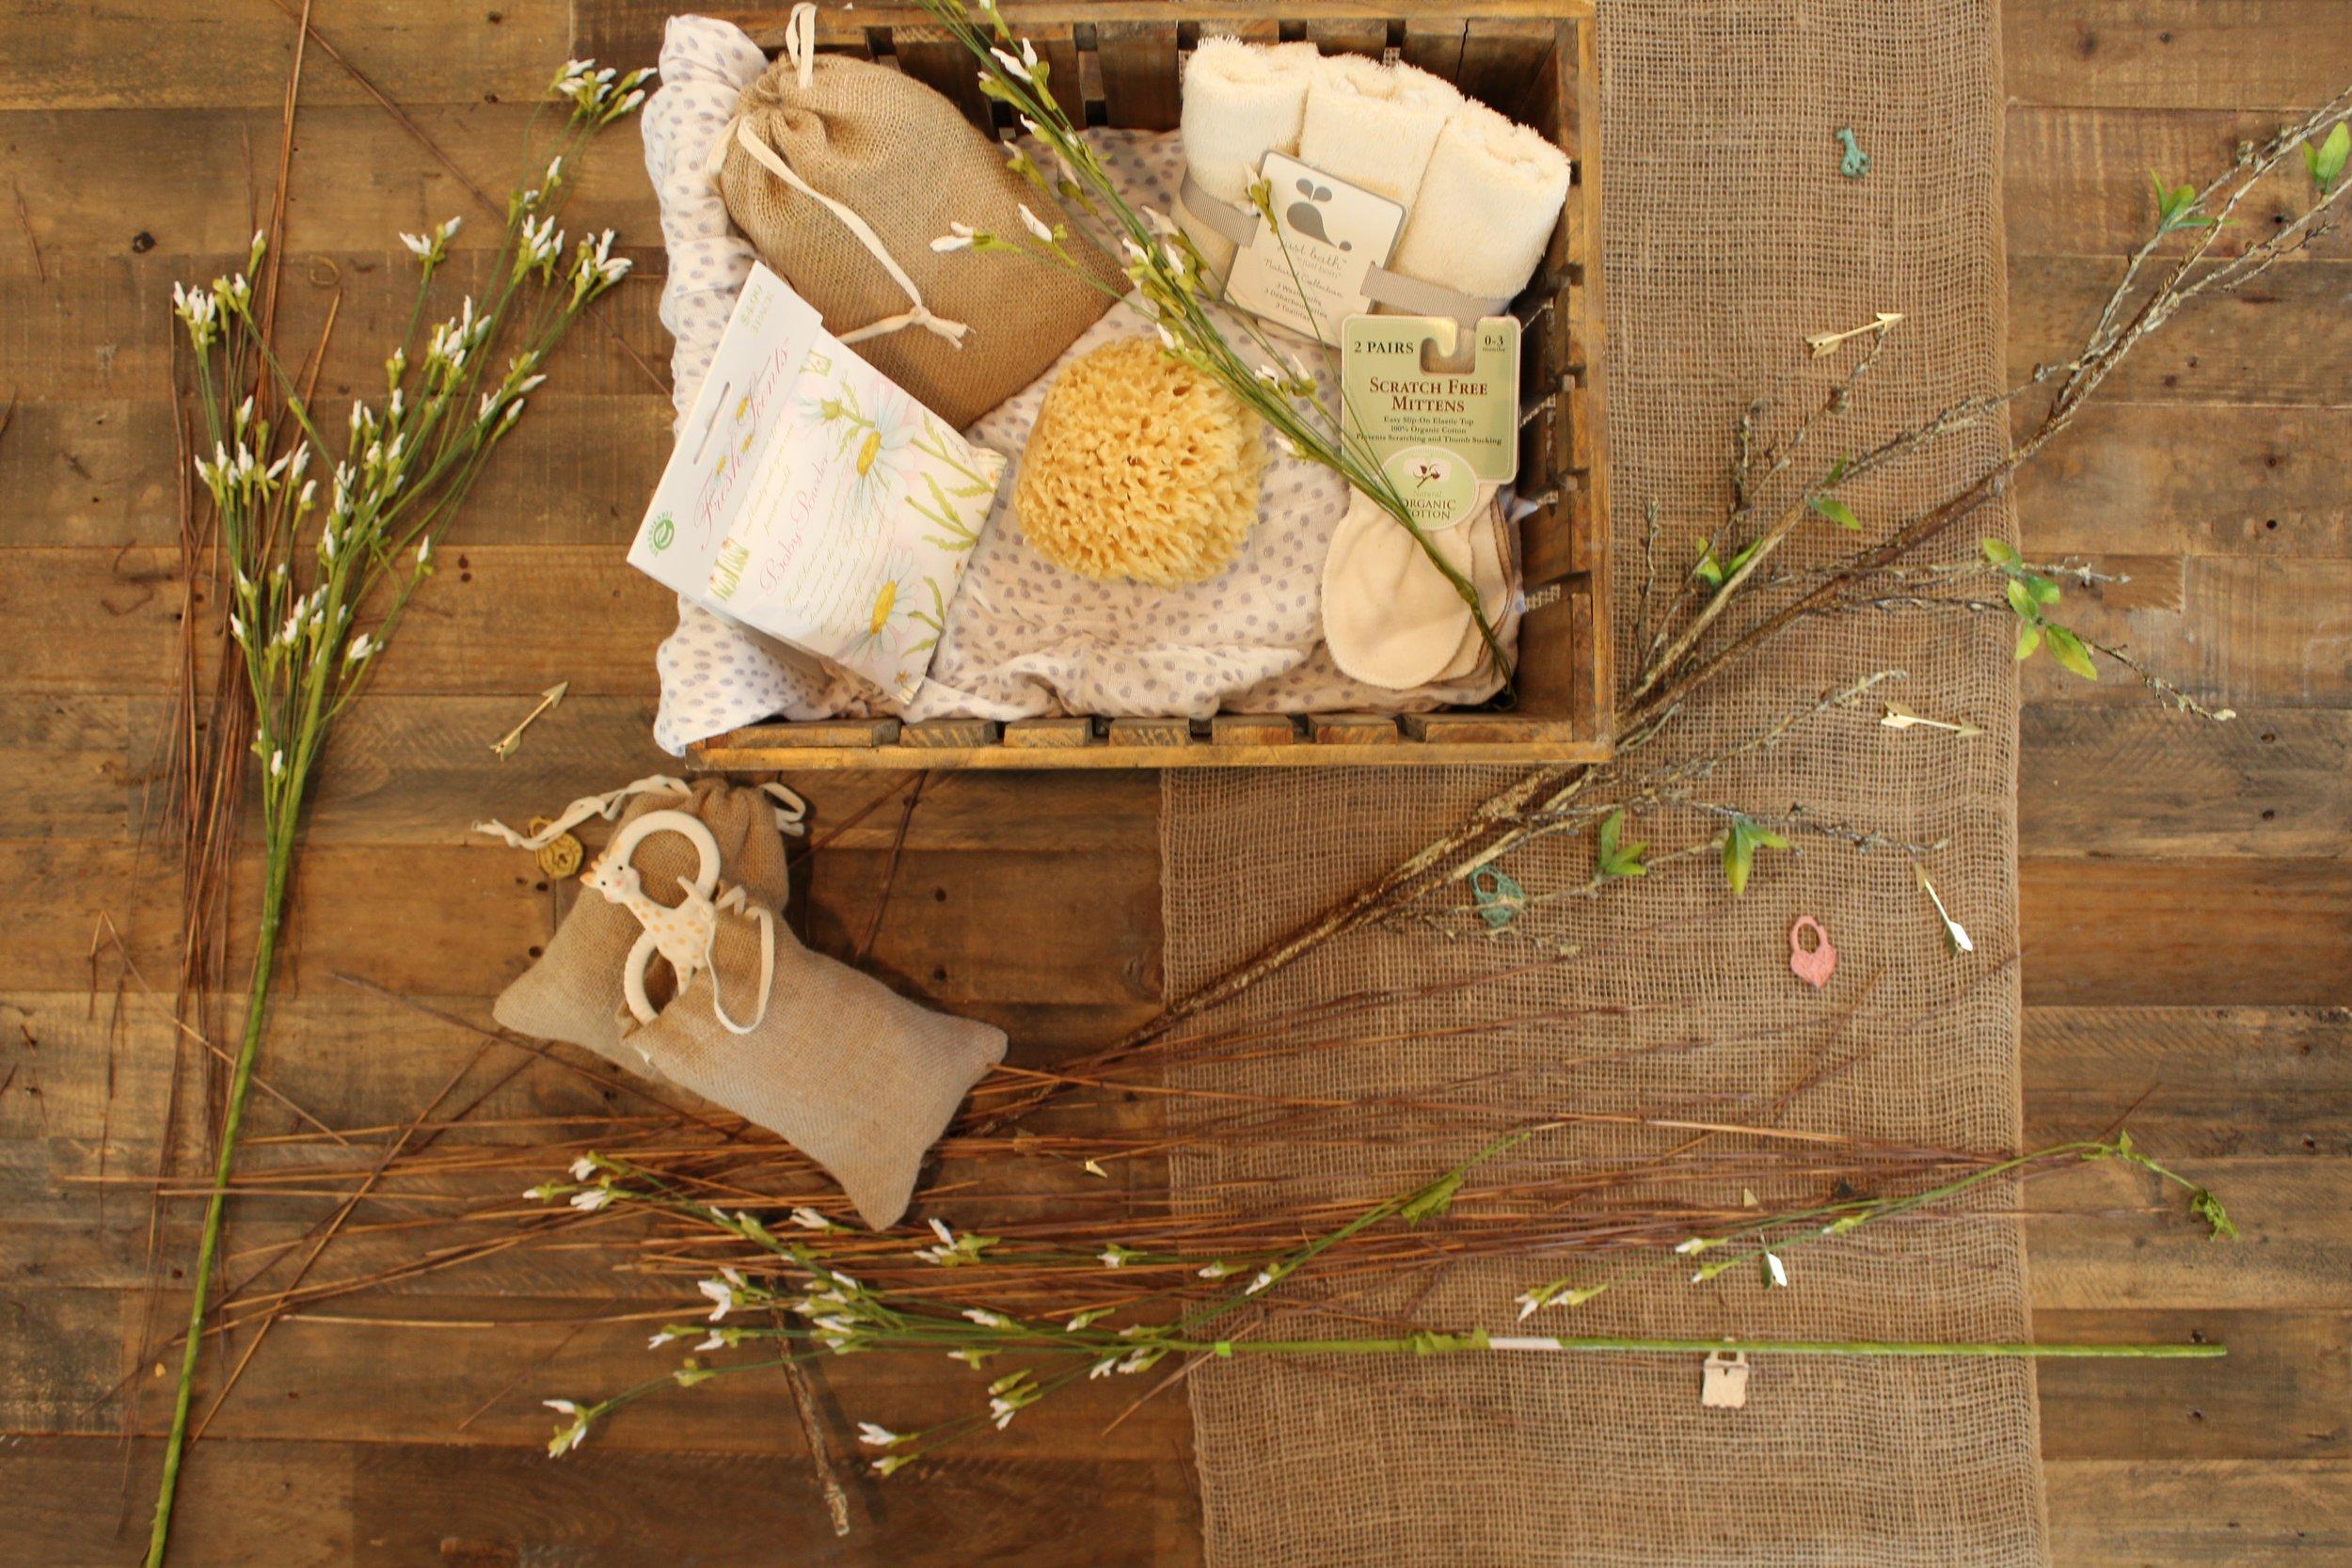 Vegan Gift Ideas - Gift Baskets